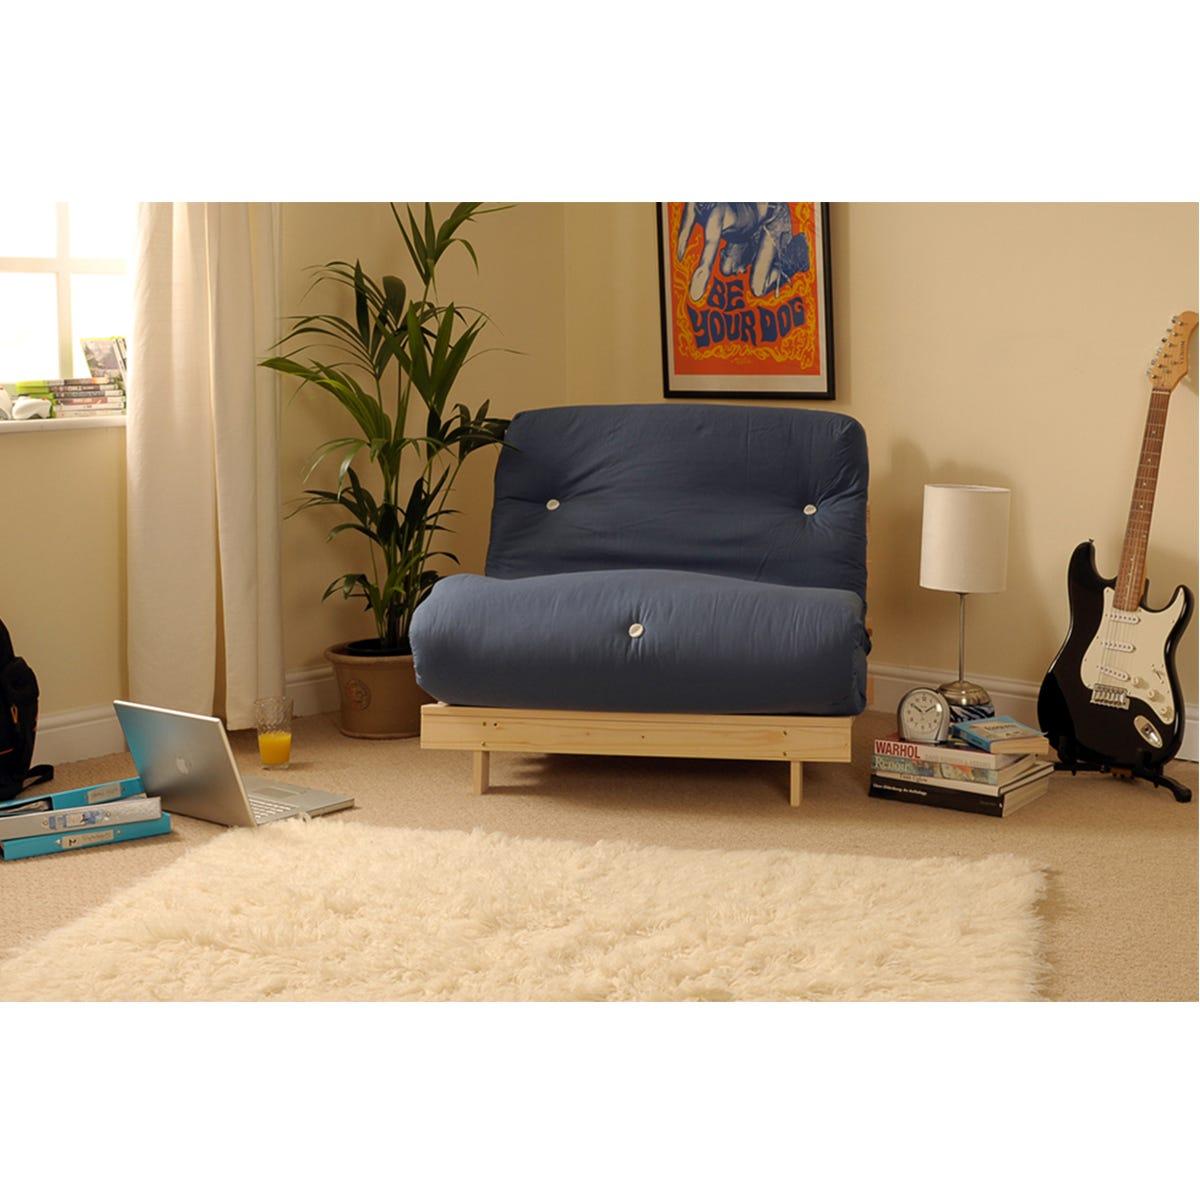 Albury Single Sofa Bed Set With Tufted Mattress - Navy